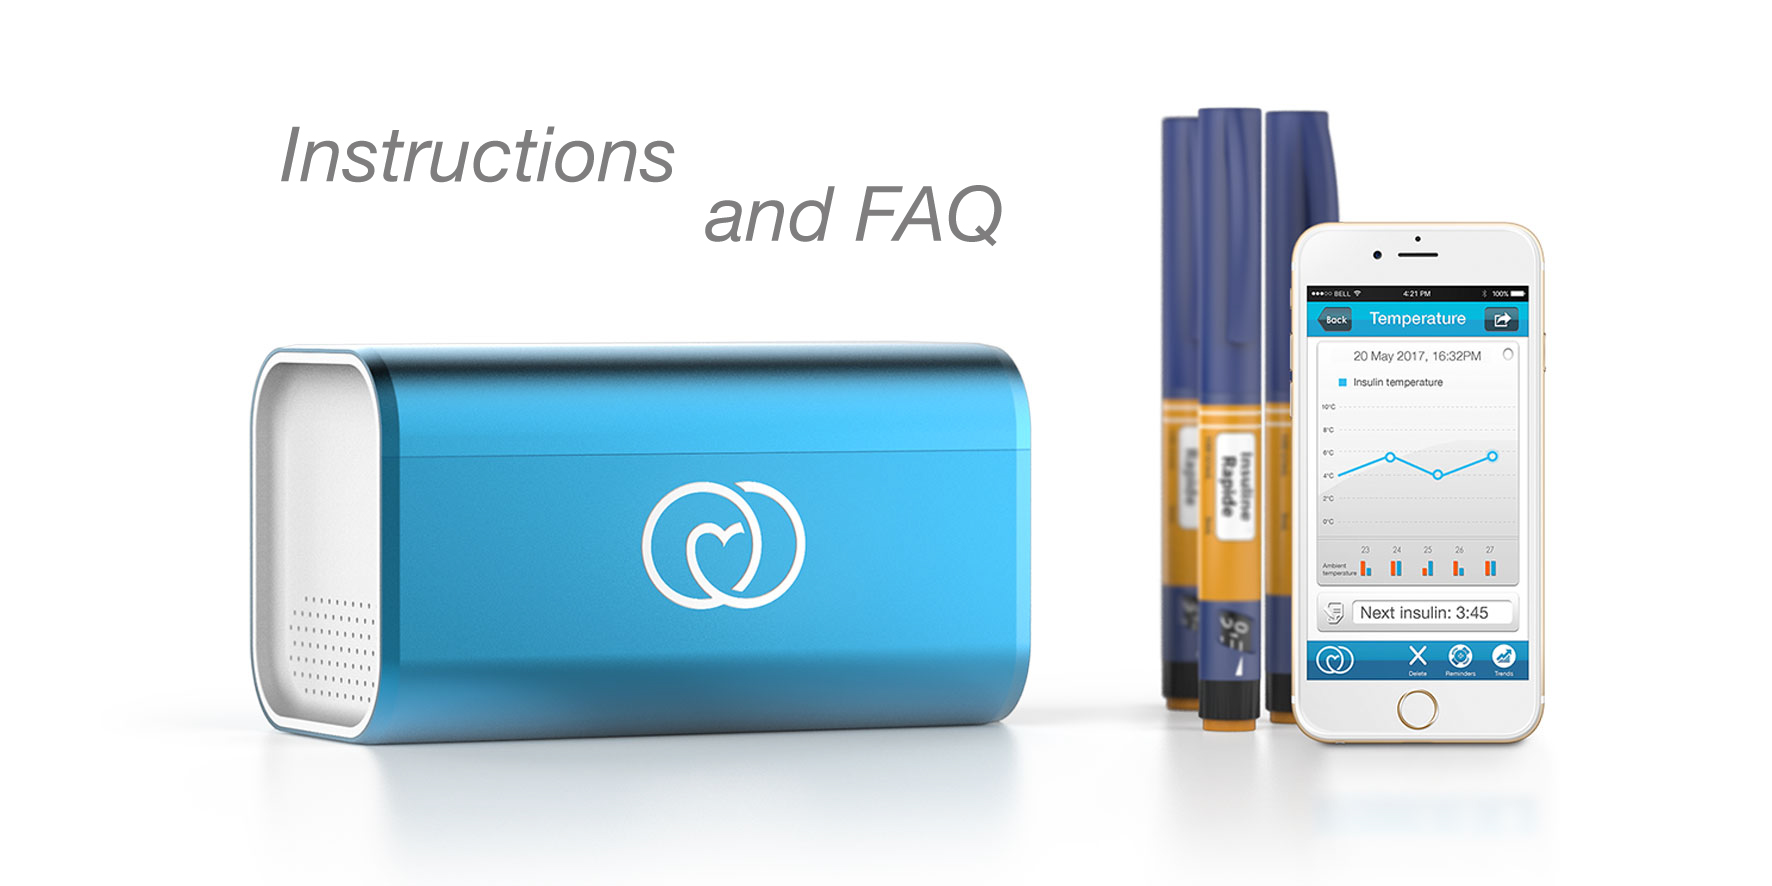 LifeinaBox Instructions and FAQ